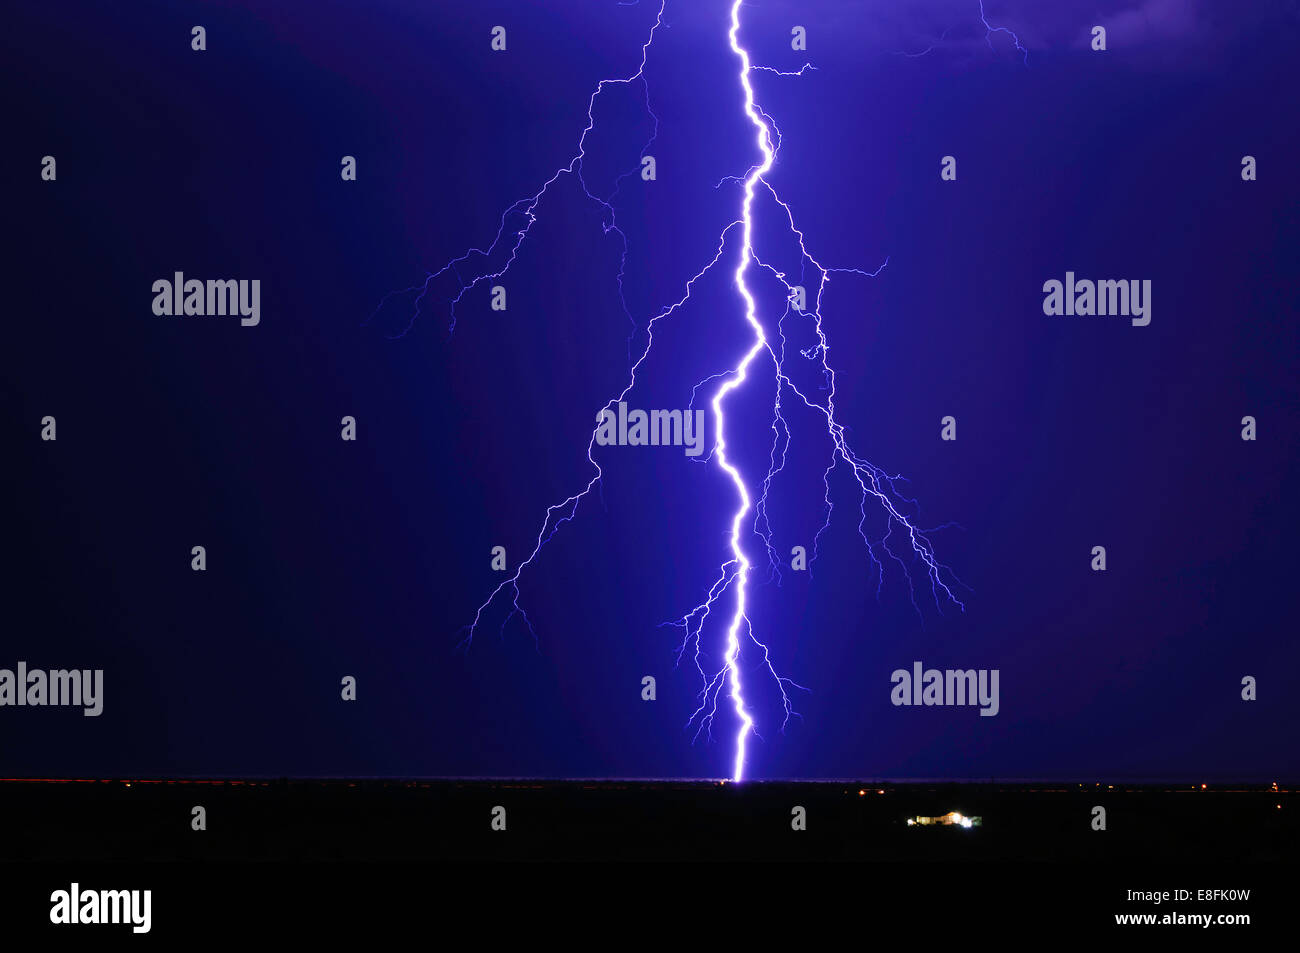 Lightning over Tonopah, Arizona, America, USA - Stock Image